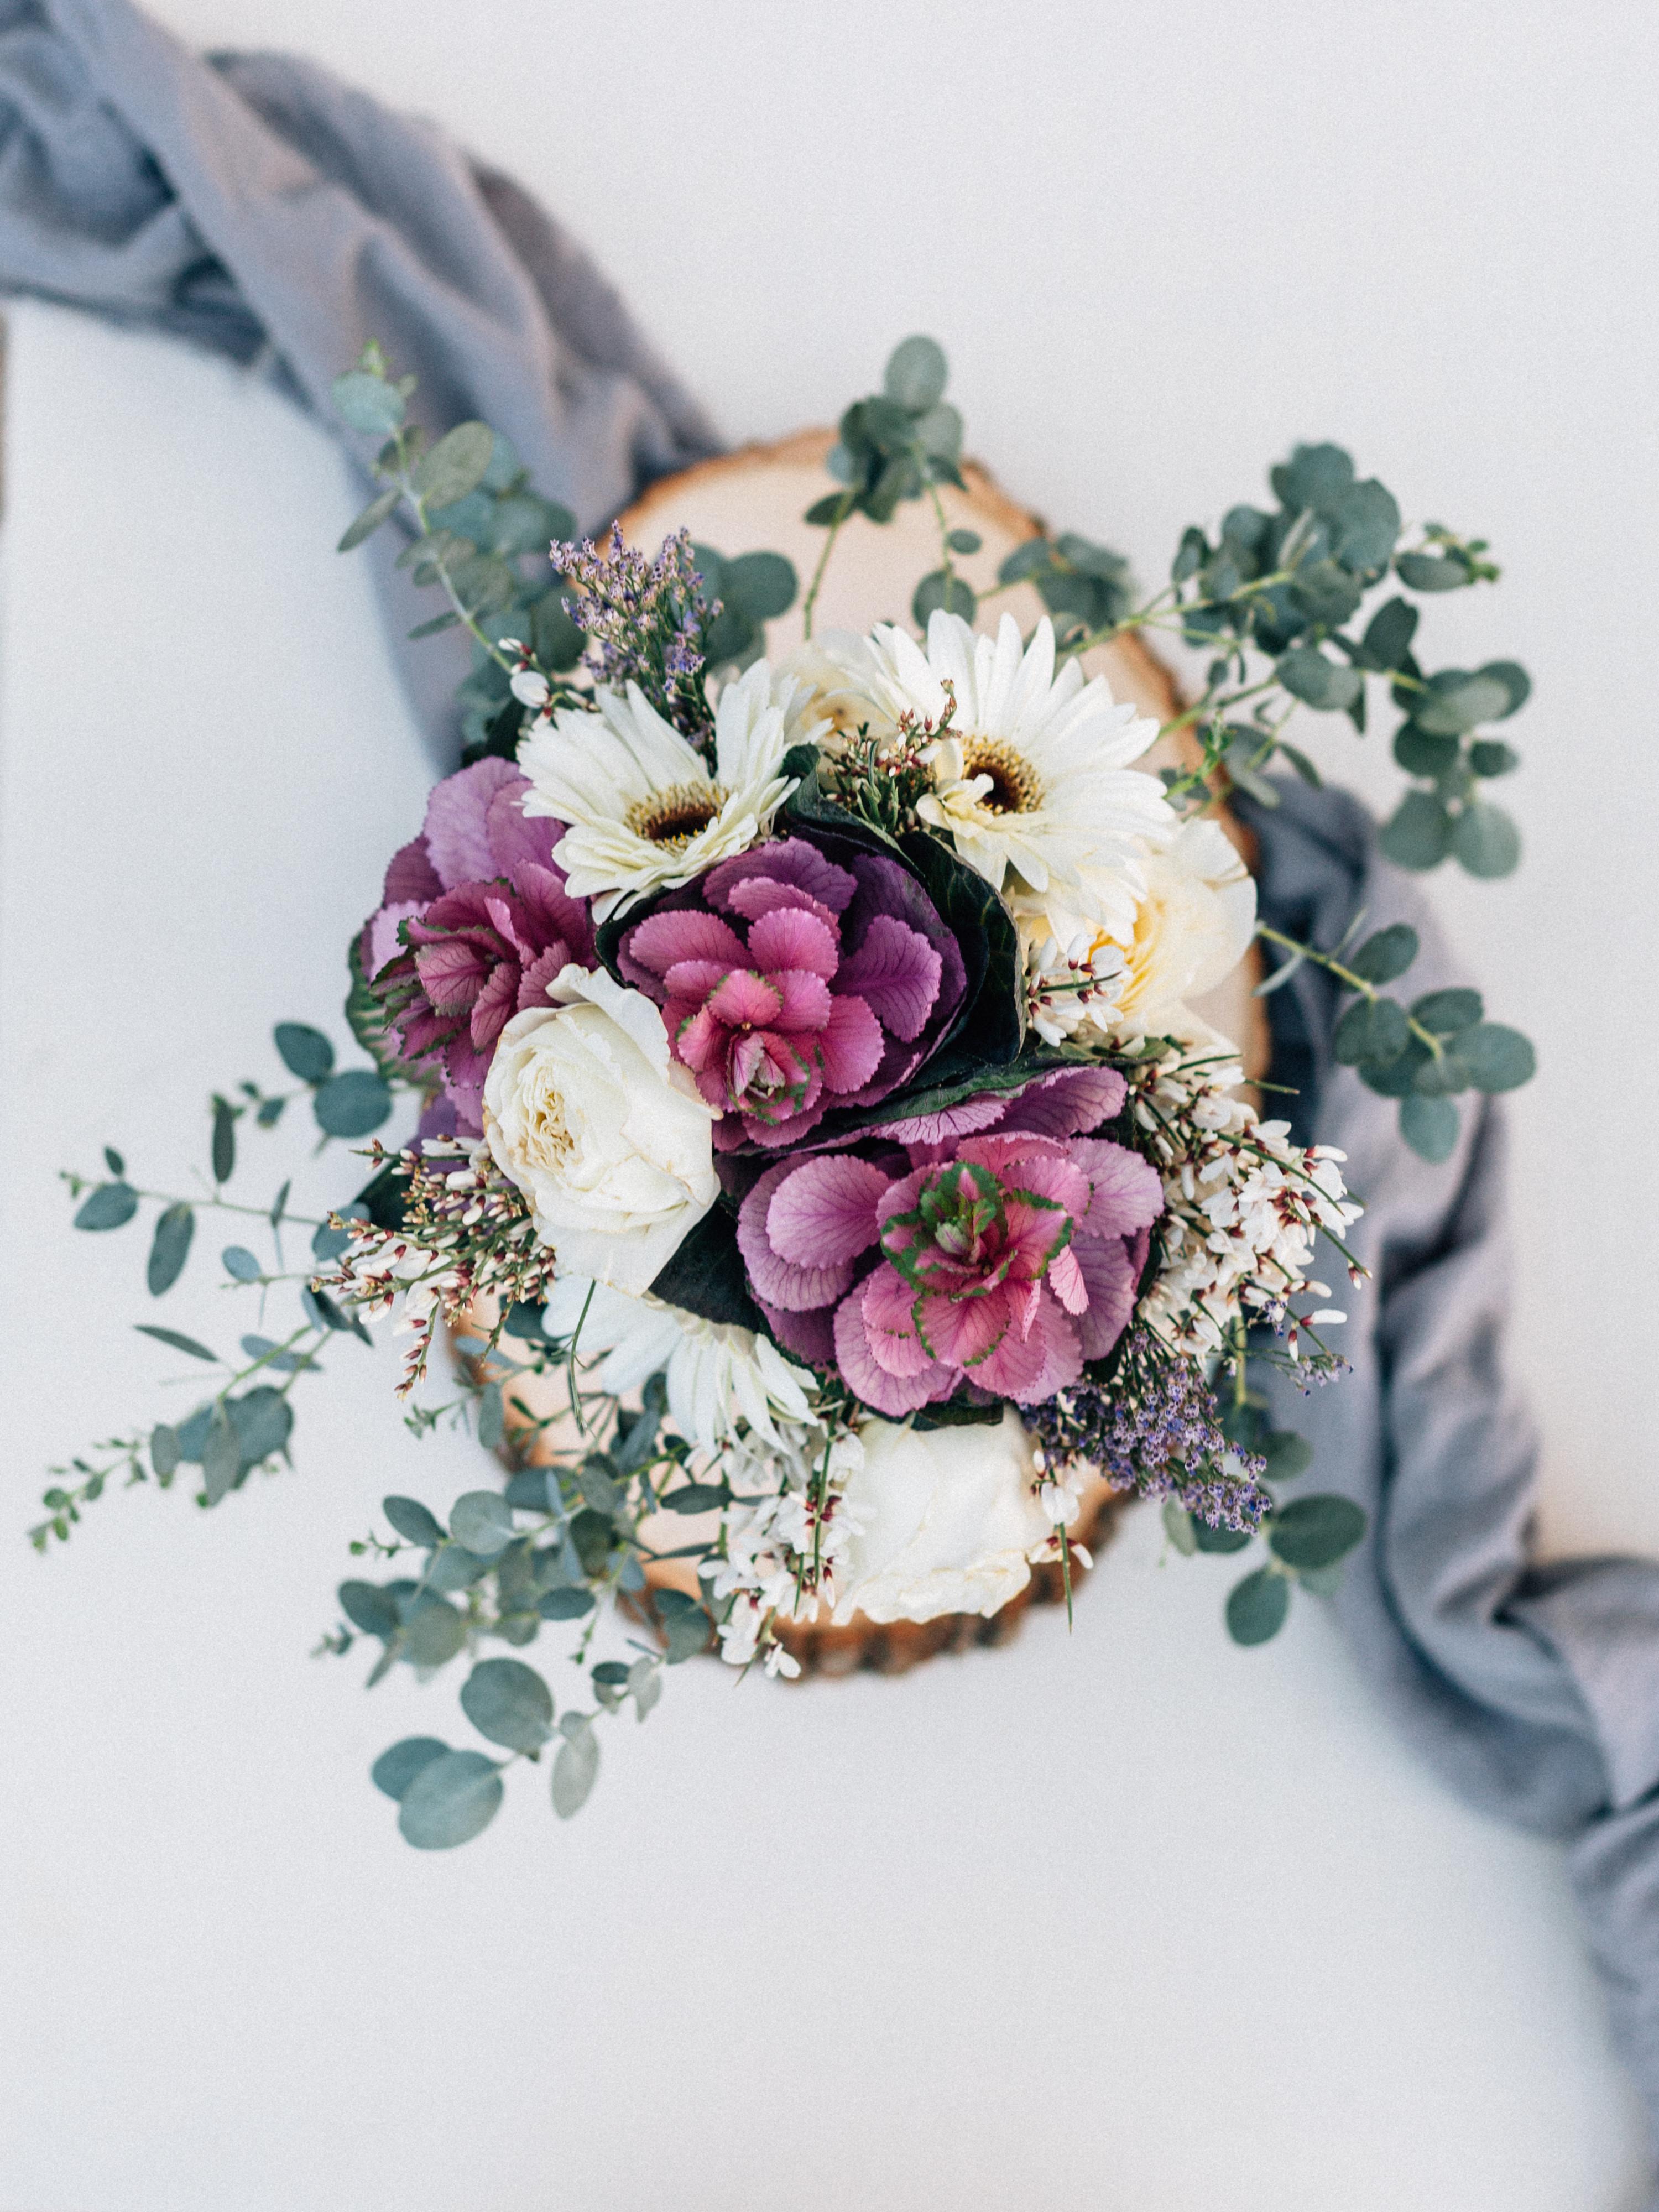 Floral Consultation